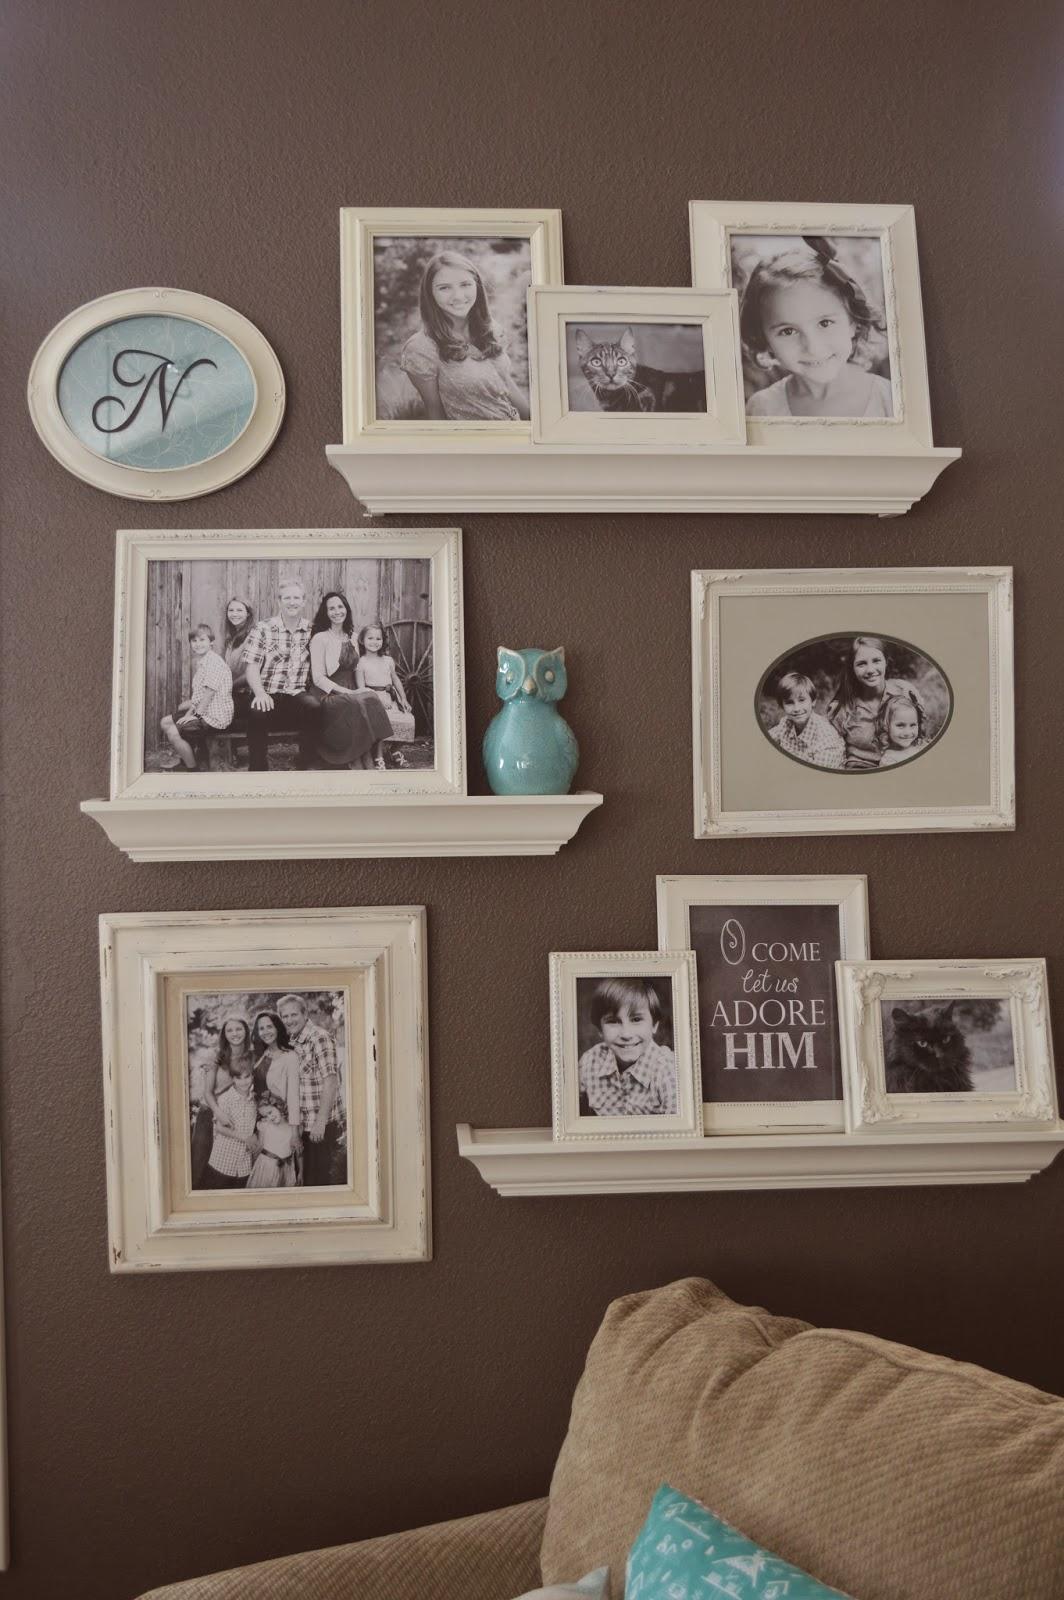 jedi craft girl gallery wall update